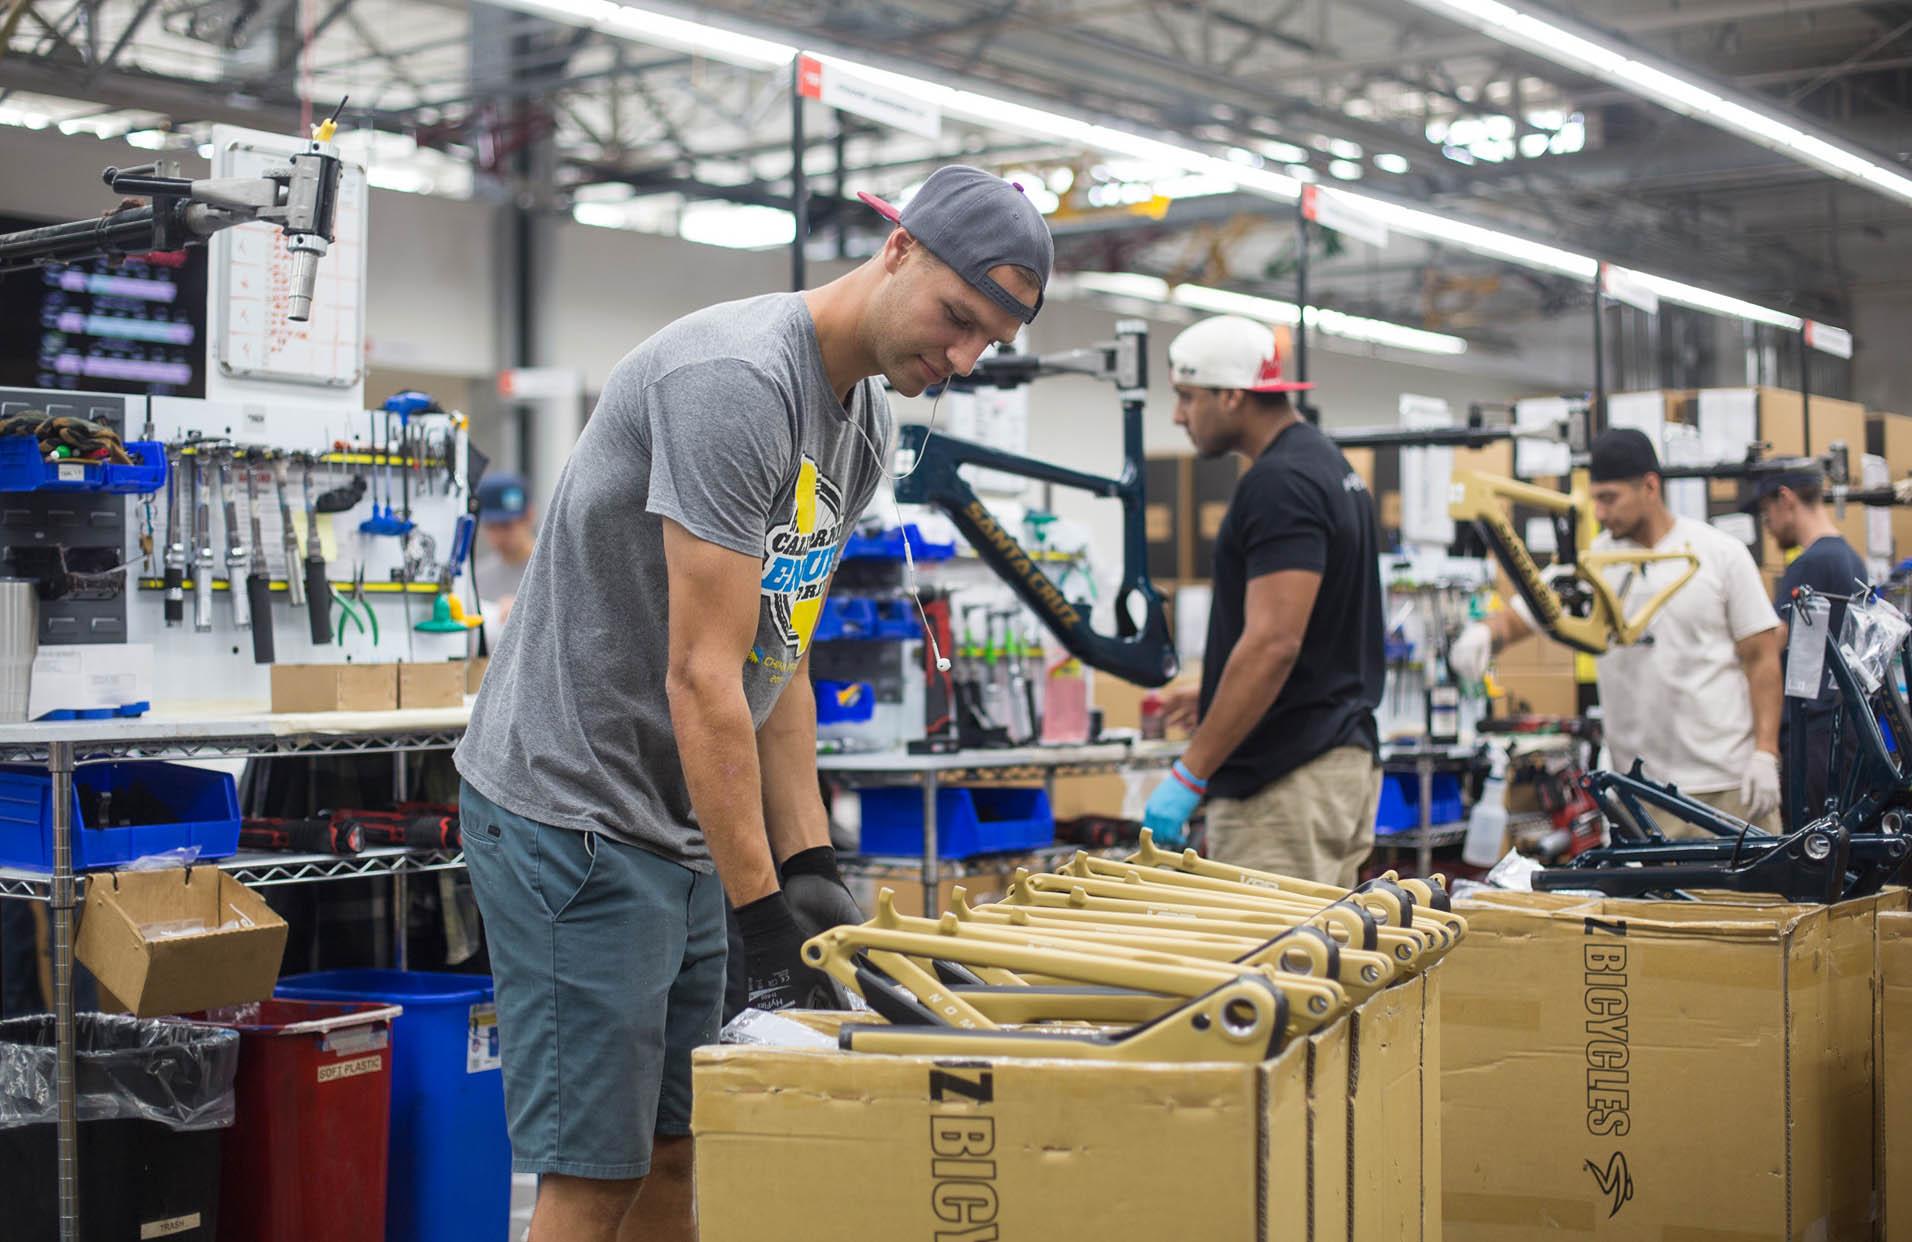 Santa Cruz Bicycles - About Us Factory